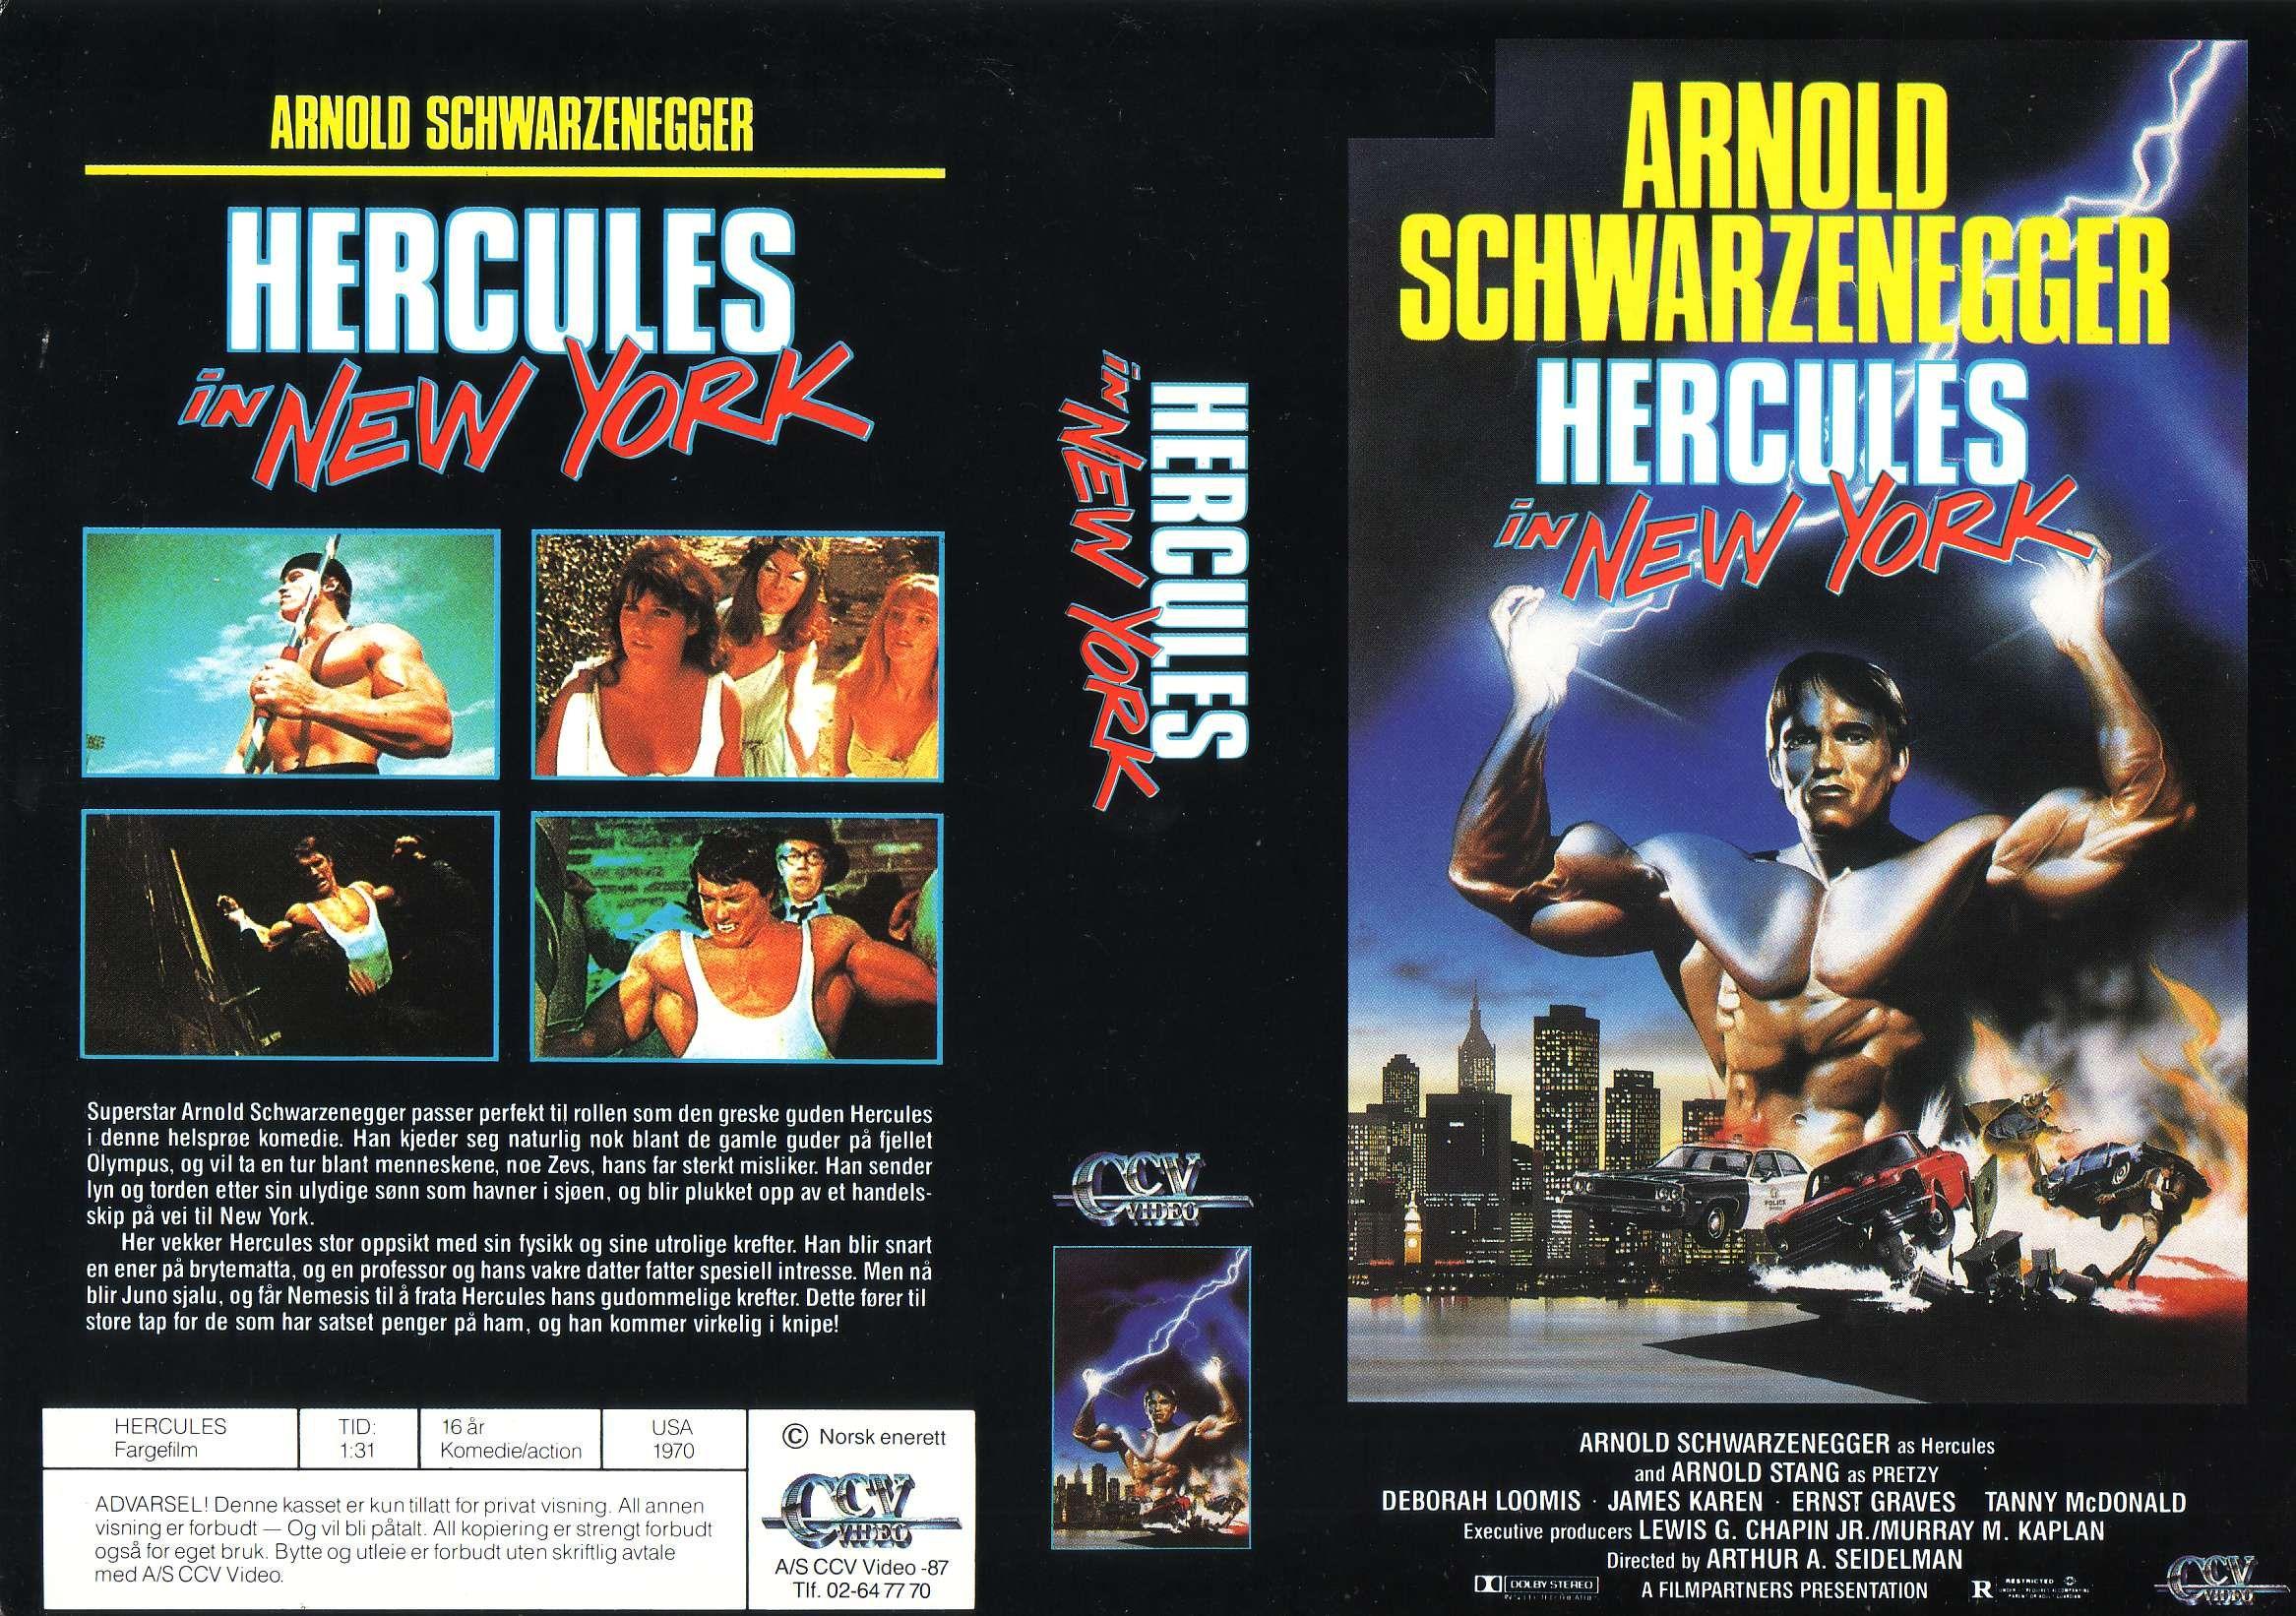 Hercules In New York 1970 Gallery IMDb